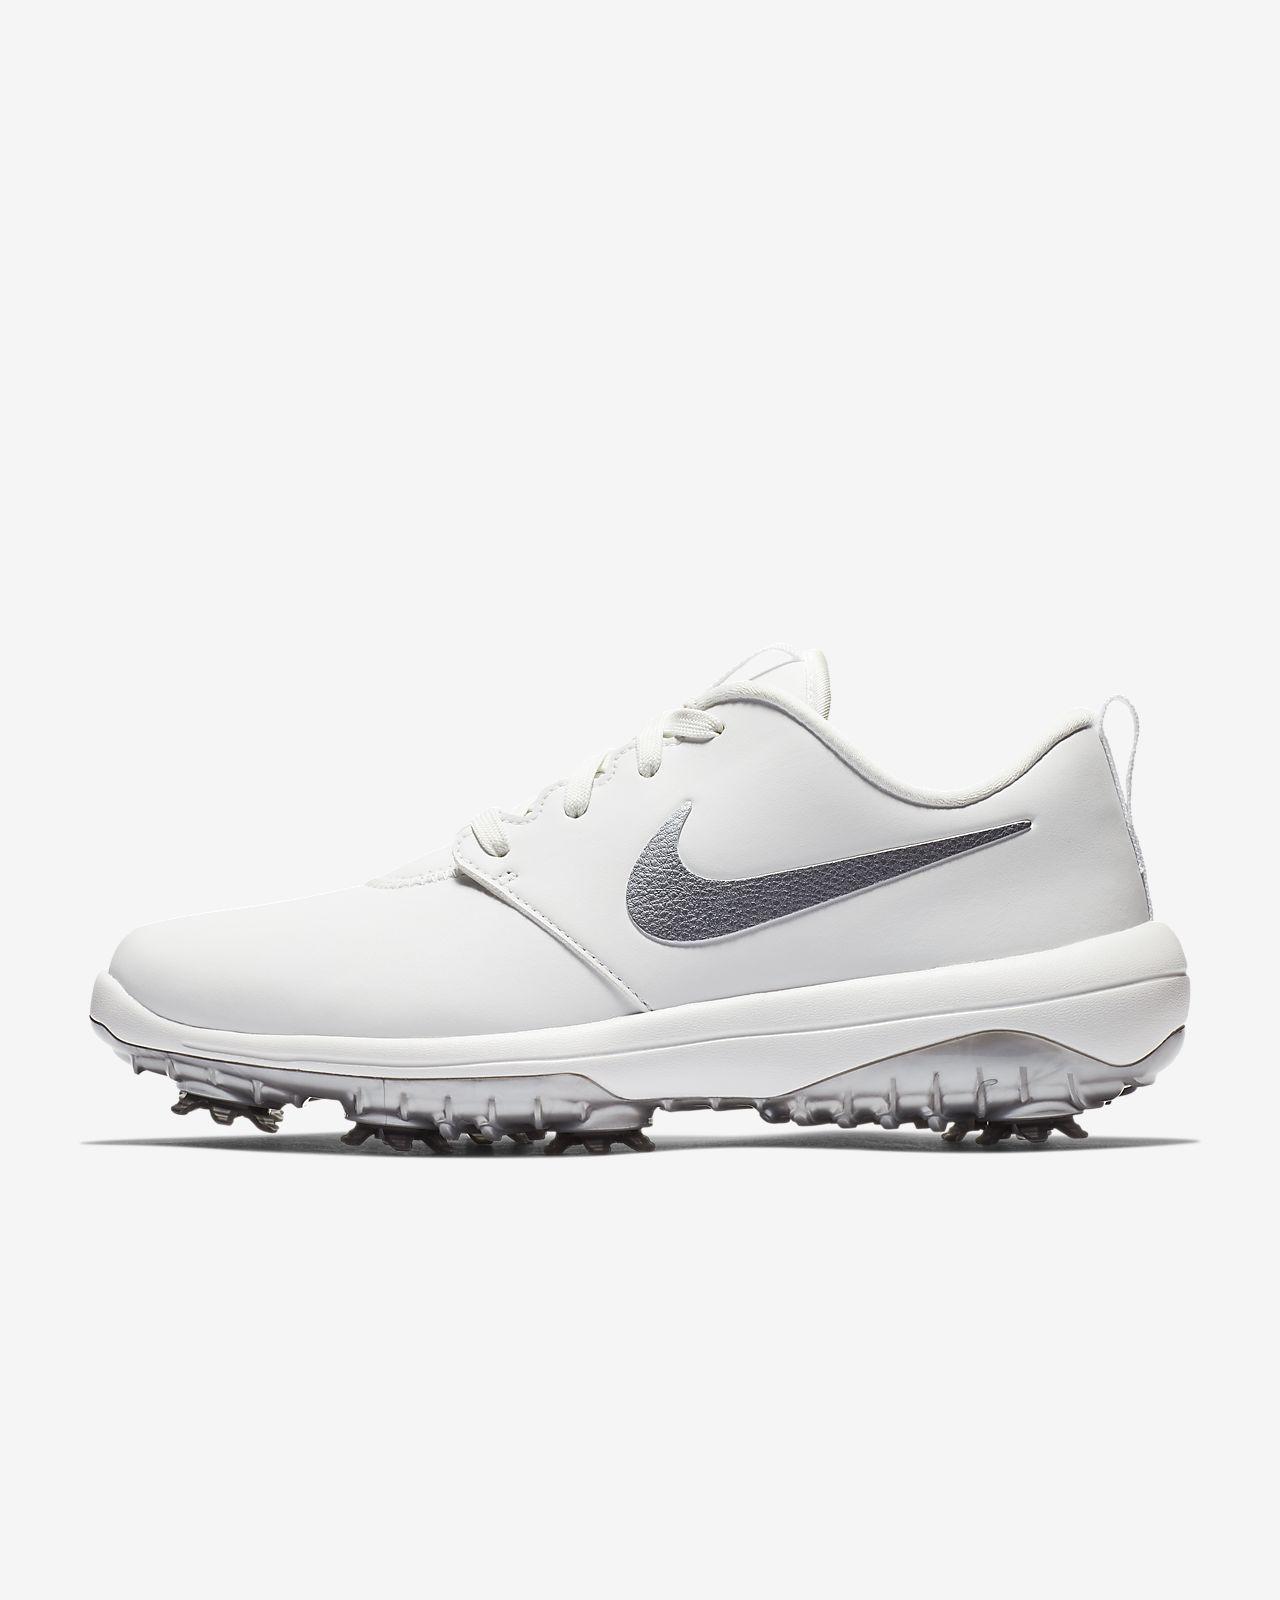 Nike Roshe G Tour Zapatillas de golf - Mujer